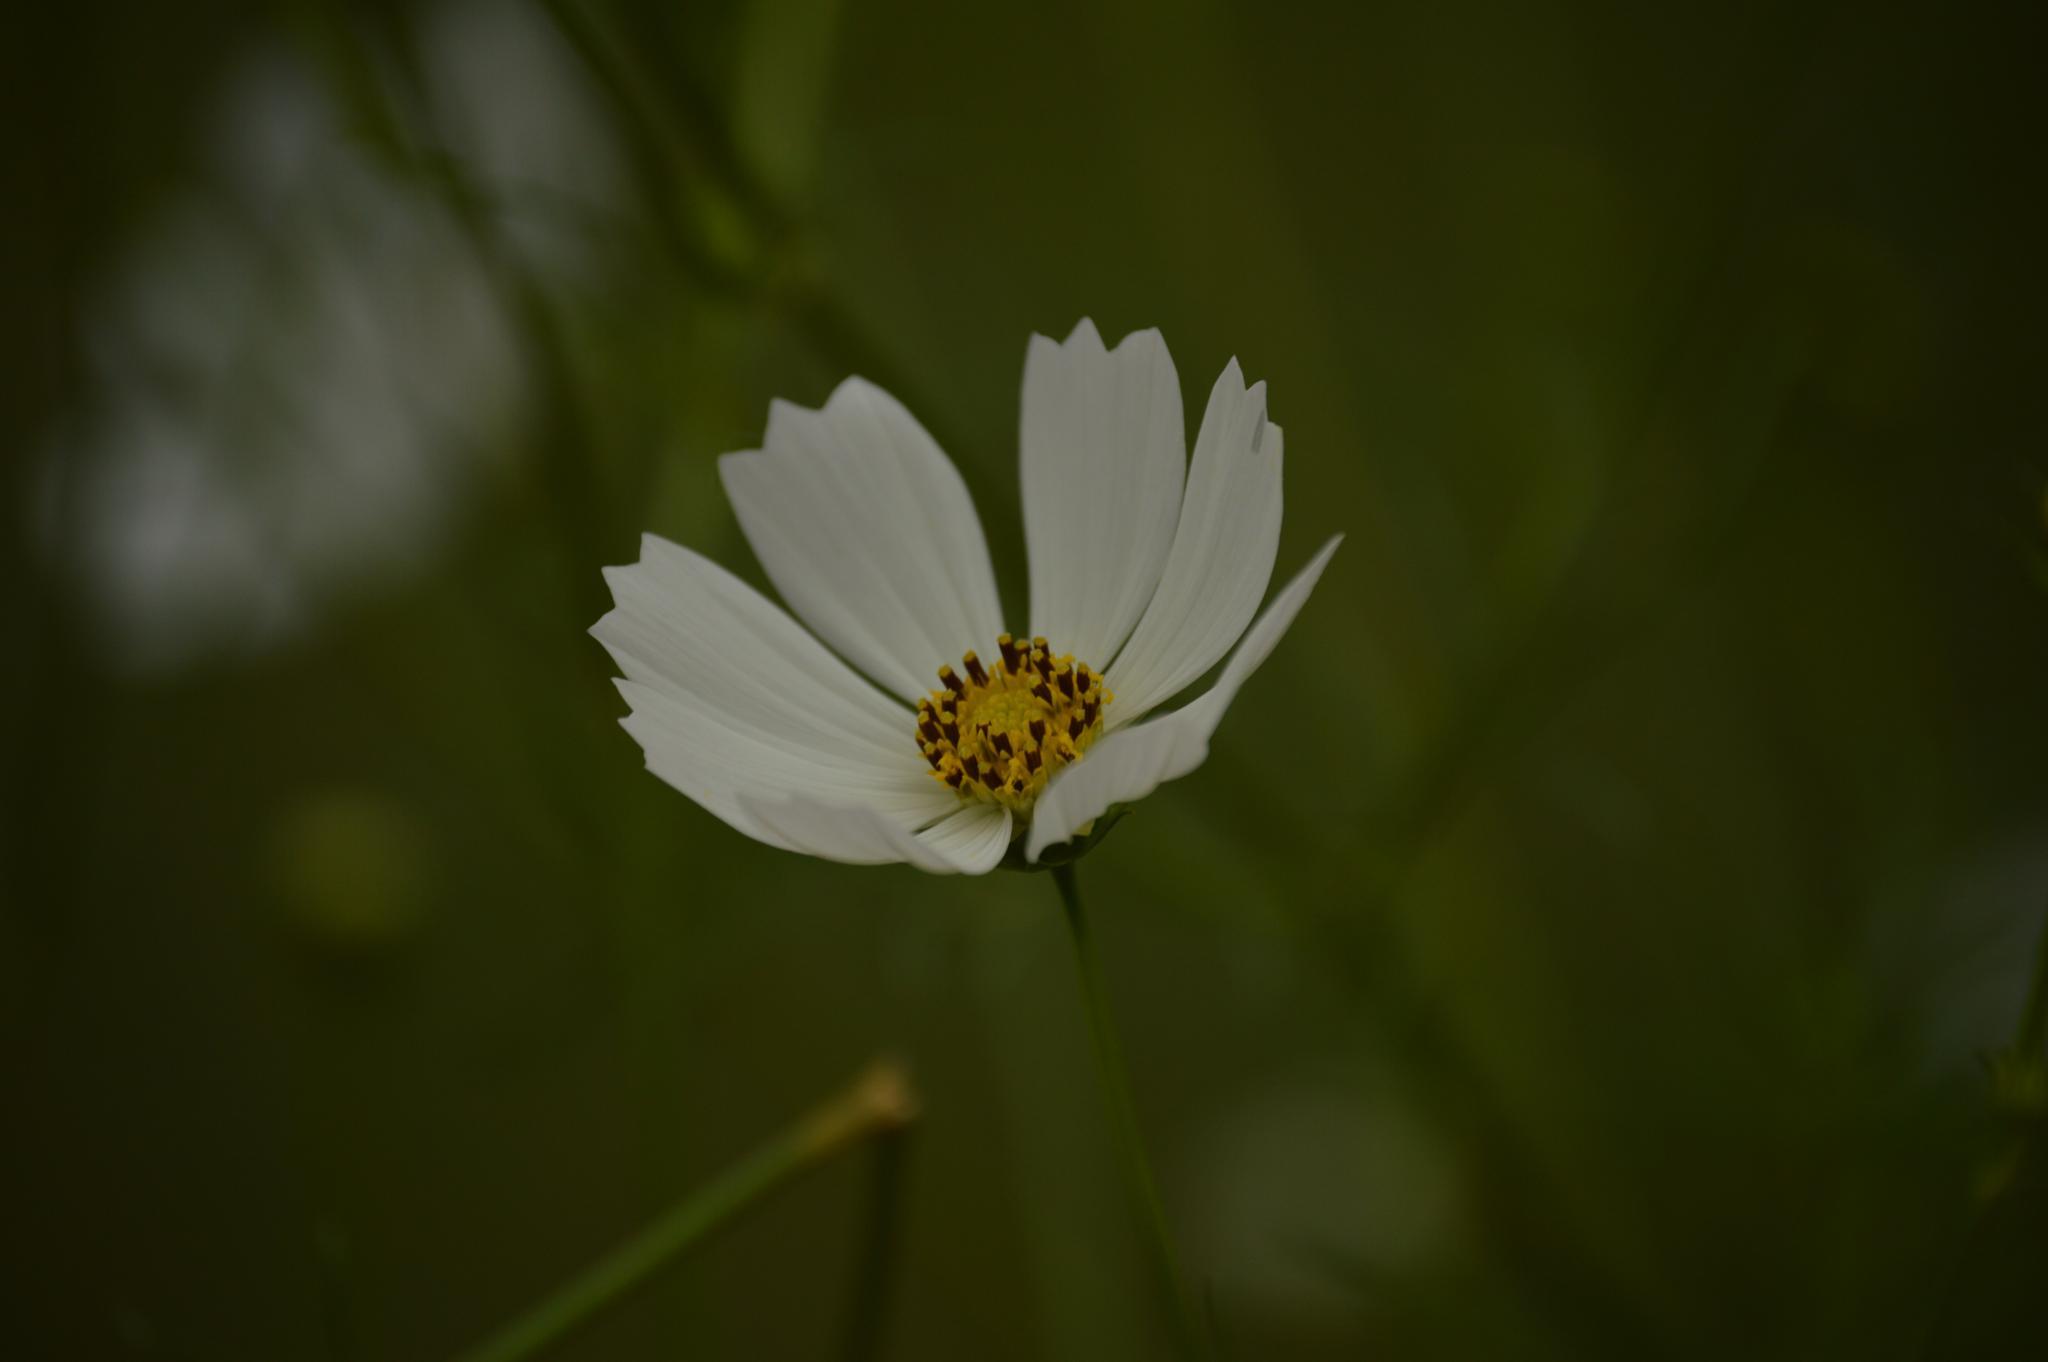 Flower by Rajmohan Pandian